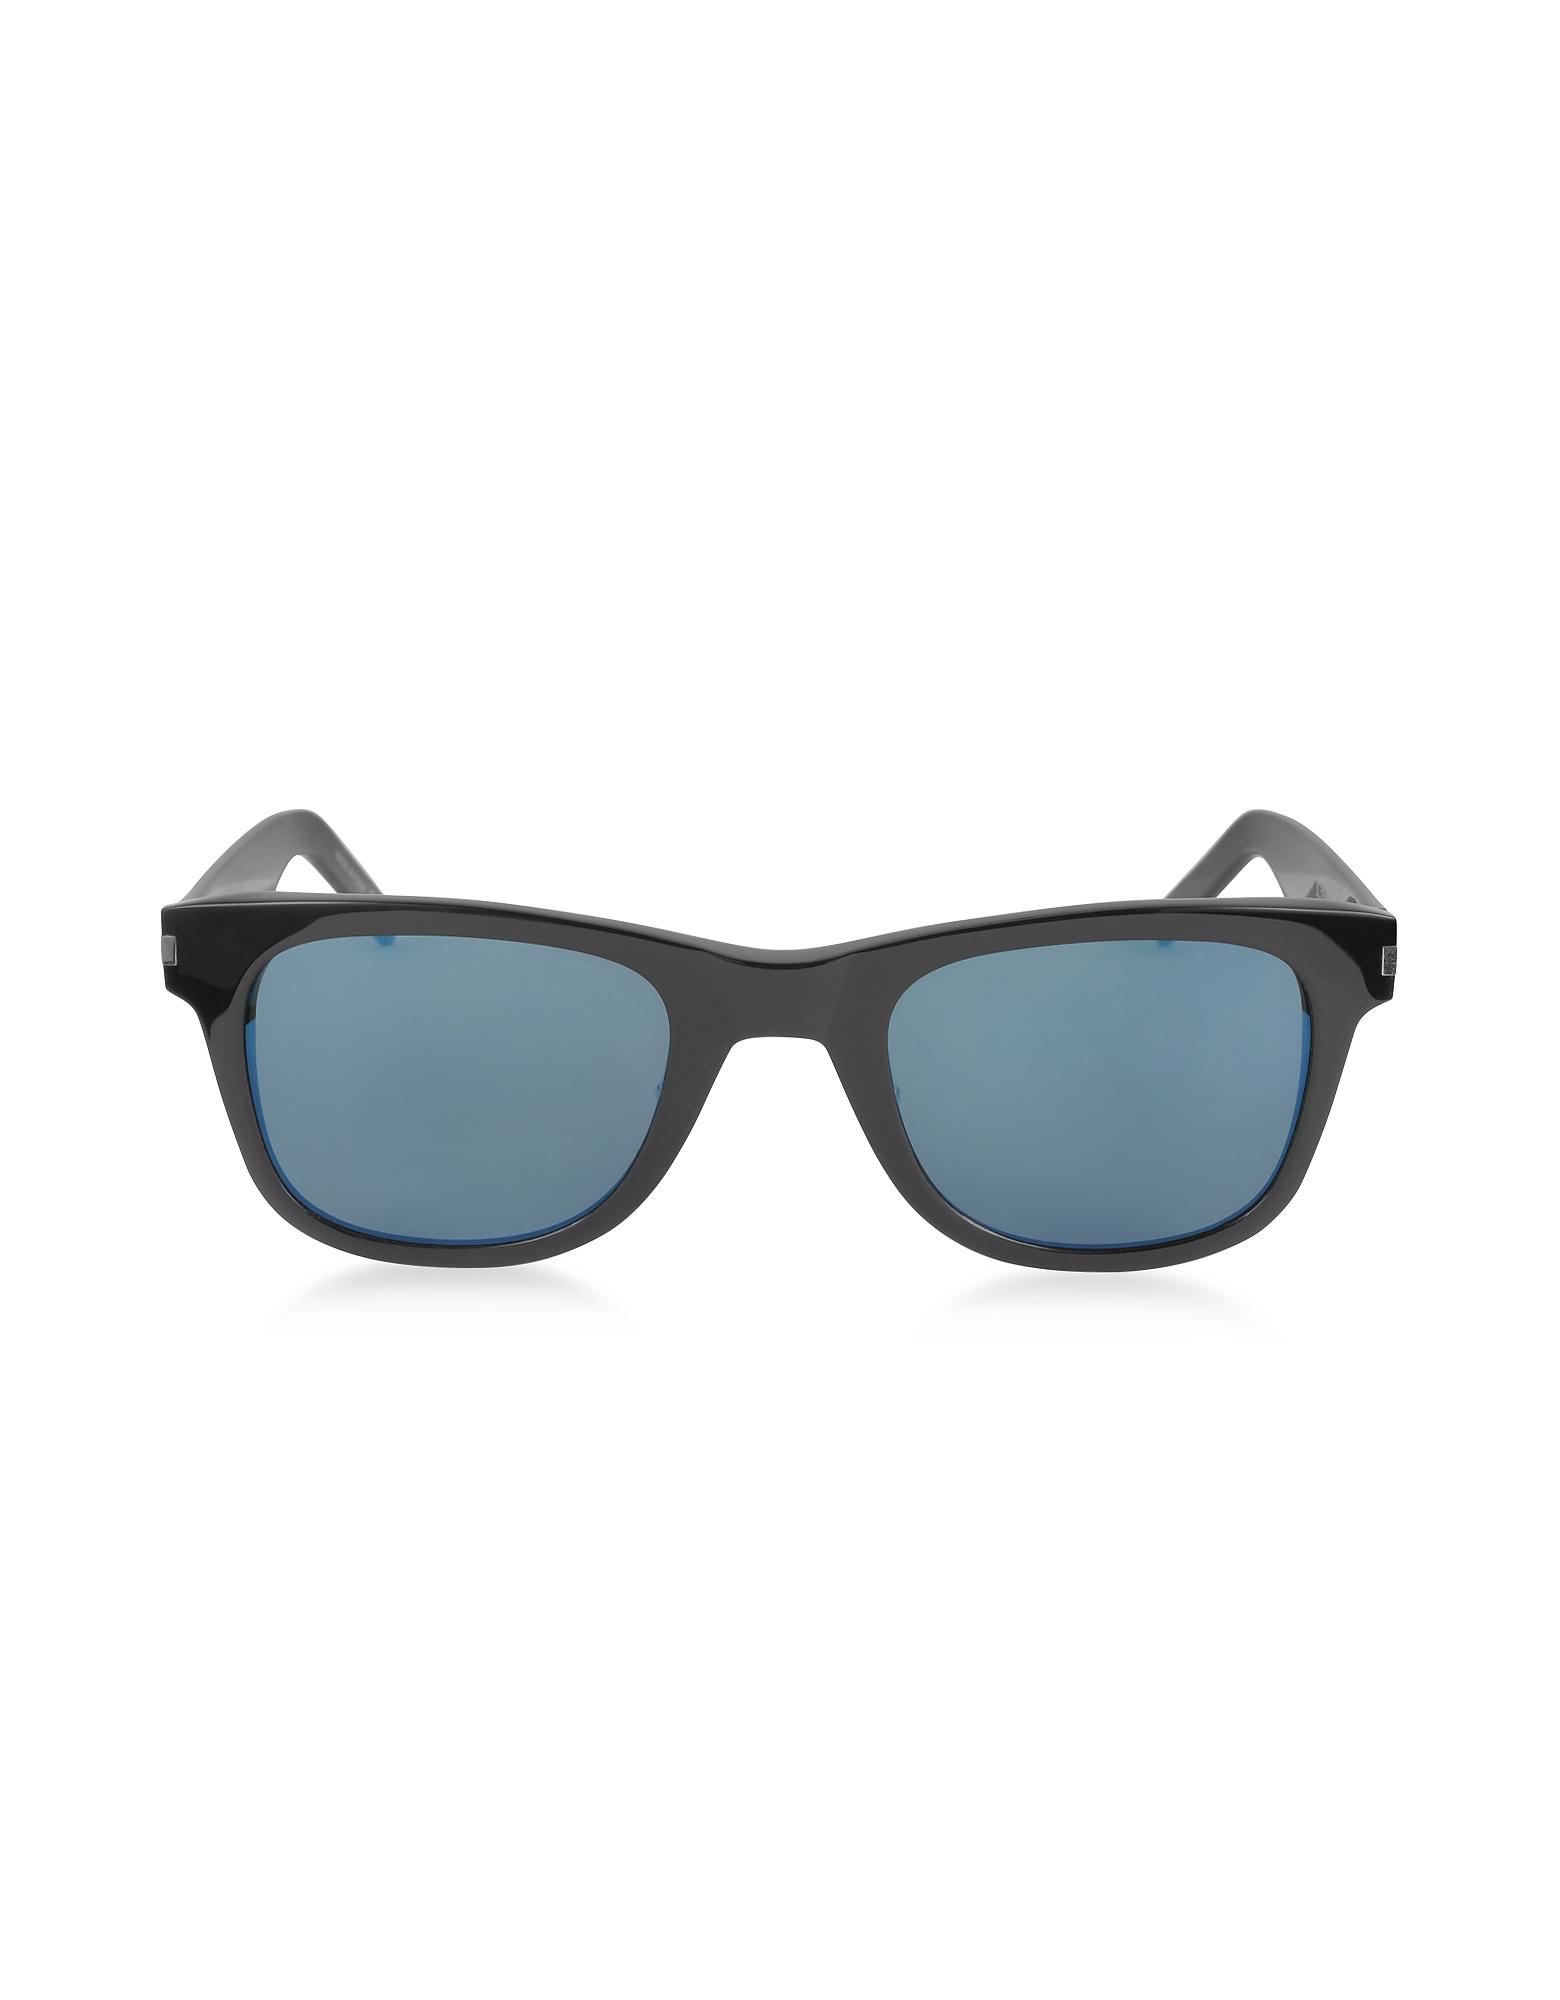 Saint Laurent Sunglasses, SL51 Slim Black Acetate Frame Women's Sunglasses